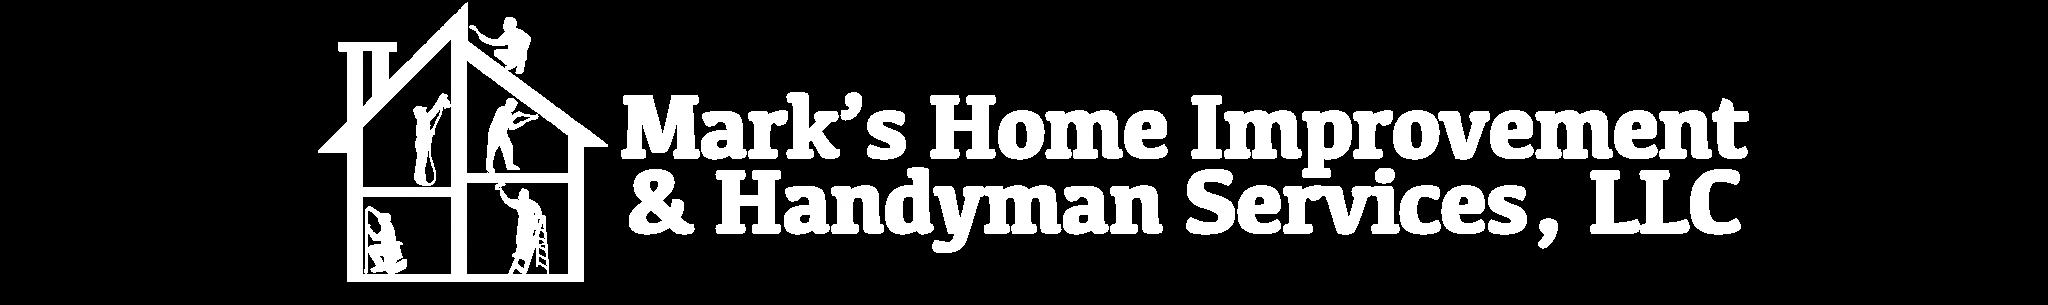 Handyman logo wide